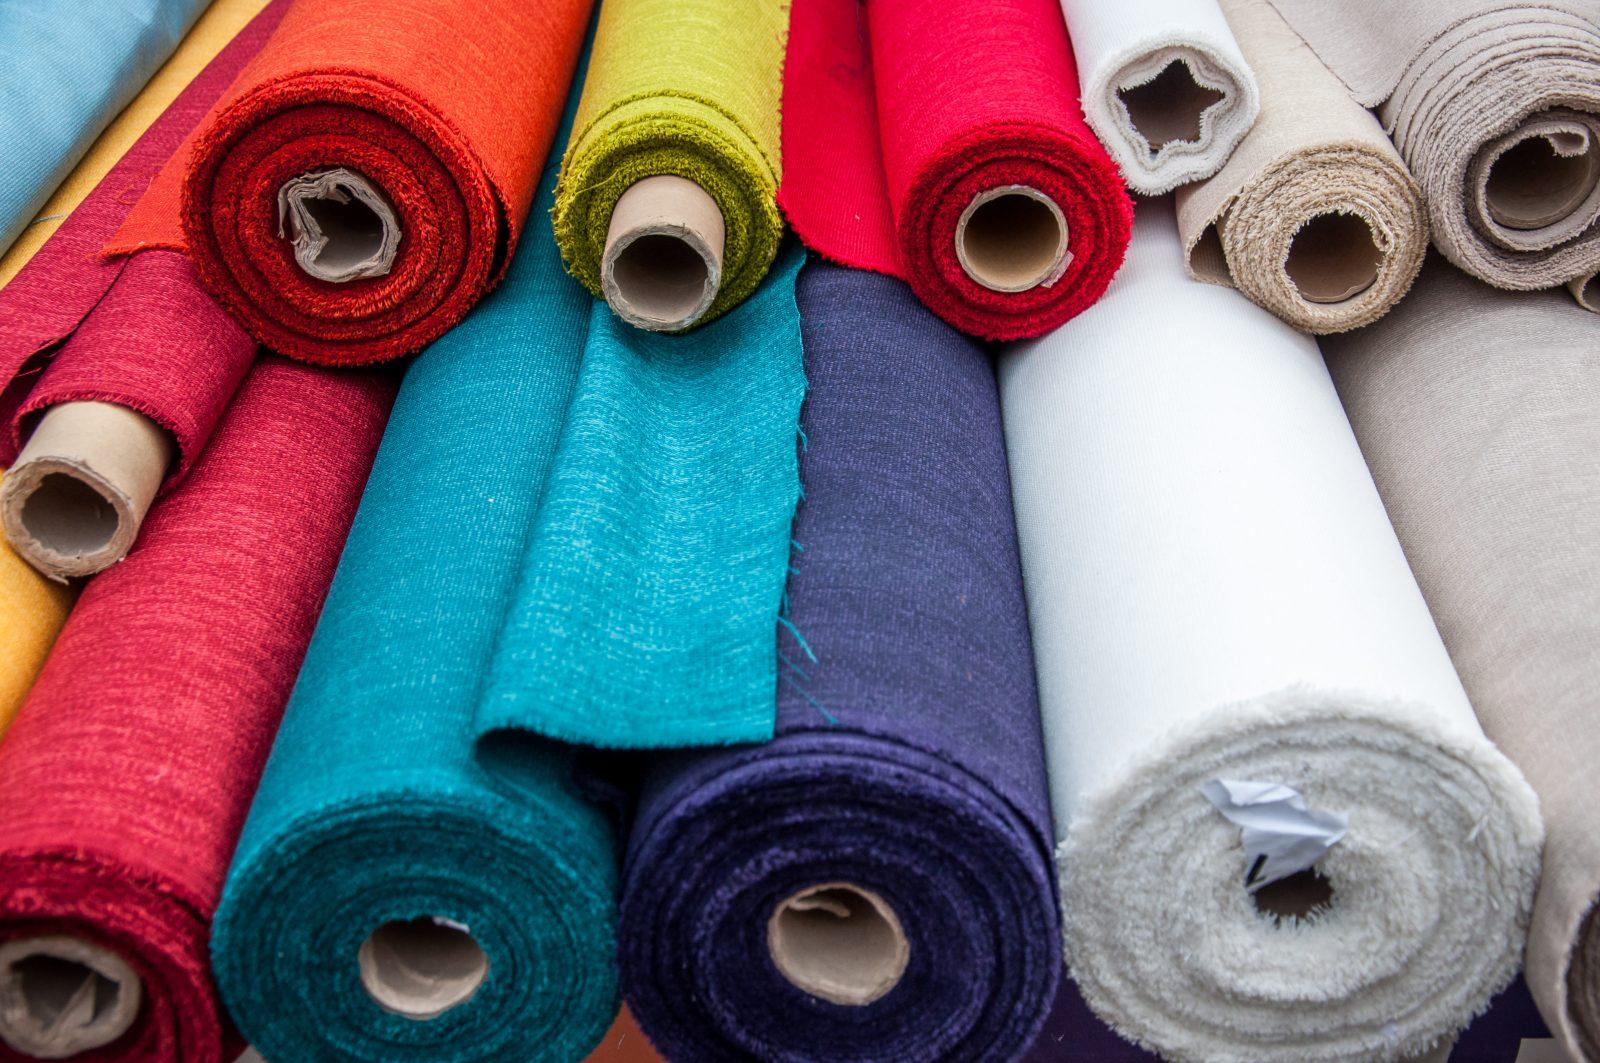 Colorful Fabric Rolls